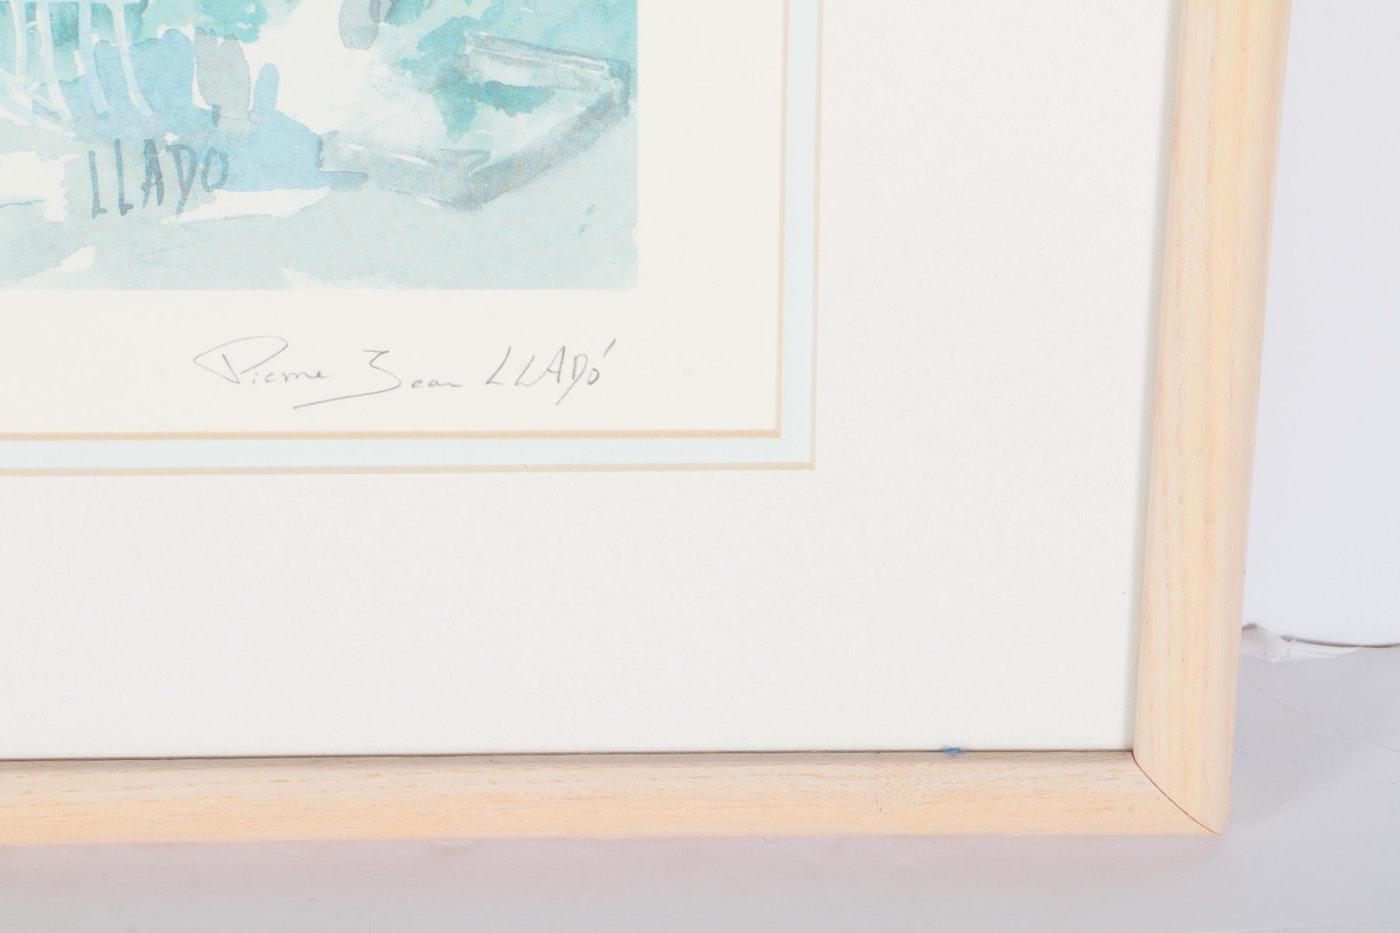 Pierre jean llado offset lithograph le jardin de sophie for Cd market galeria jardin